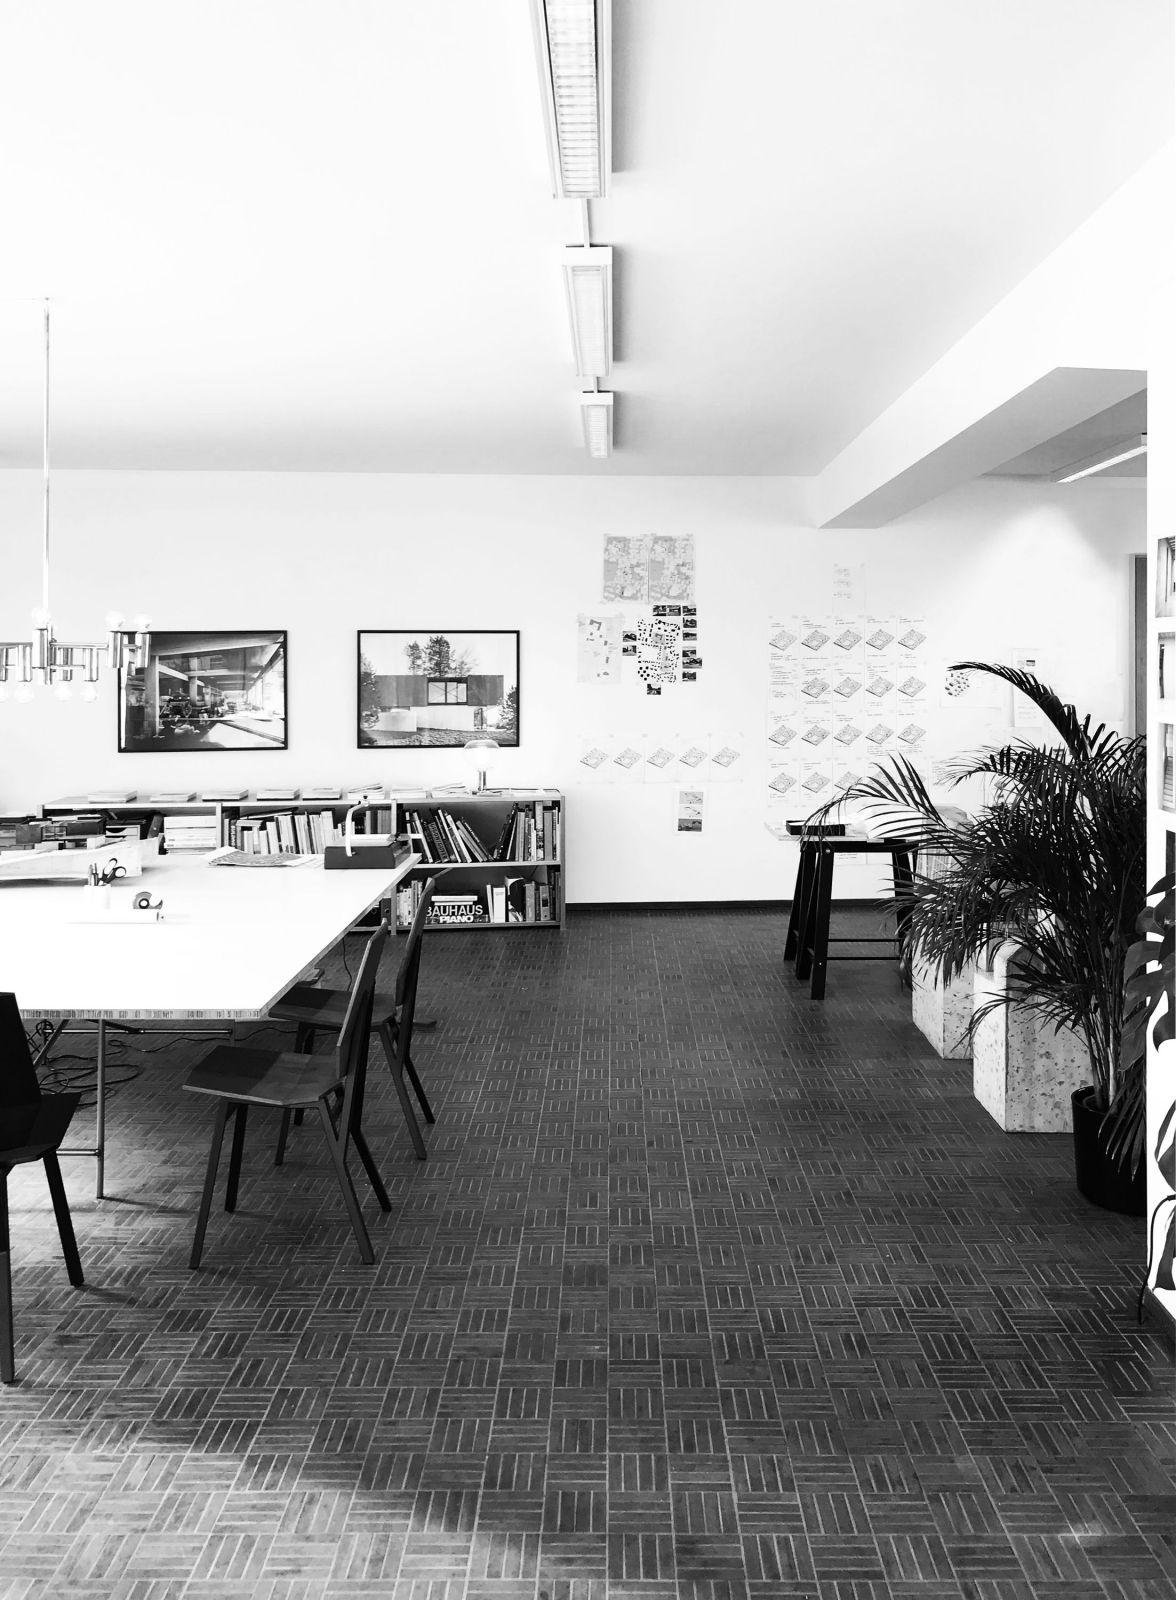 Studio lukas raeber for Bewerbung architekturstudium